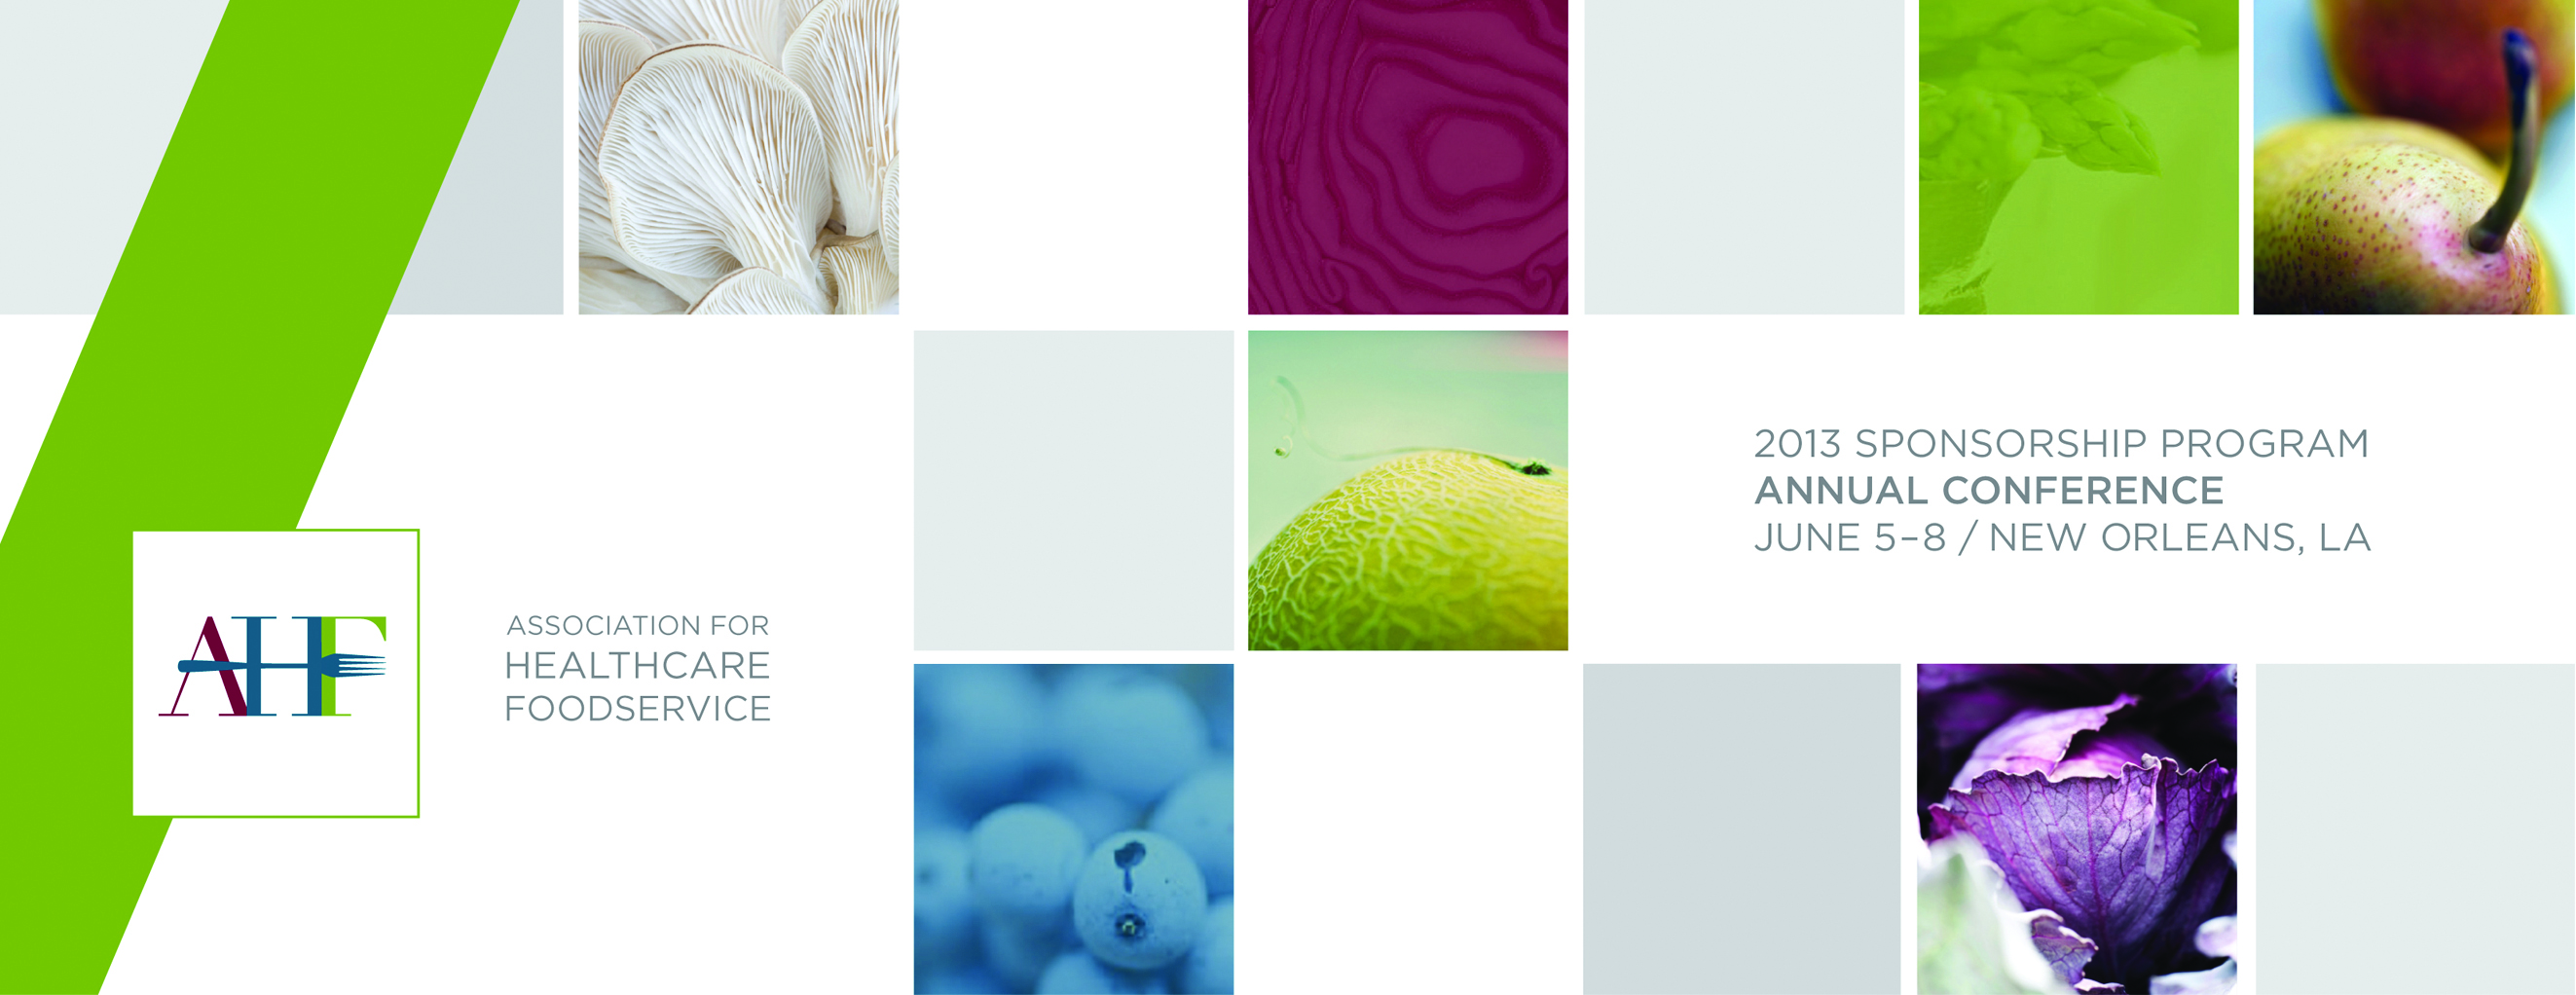 AHF 2013 Sponsorship Program